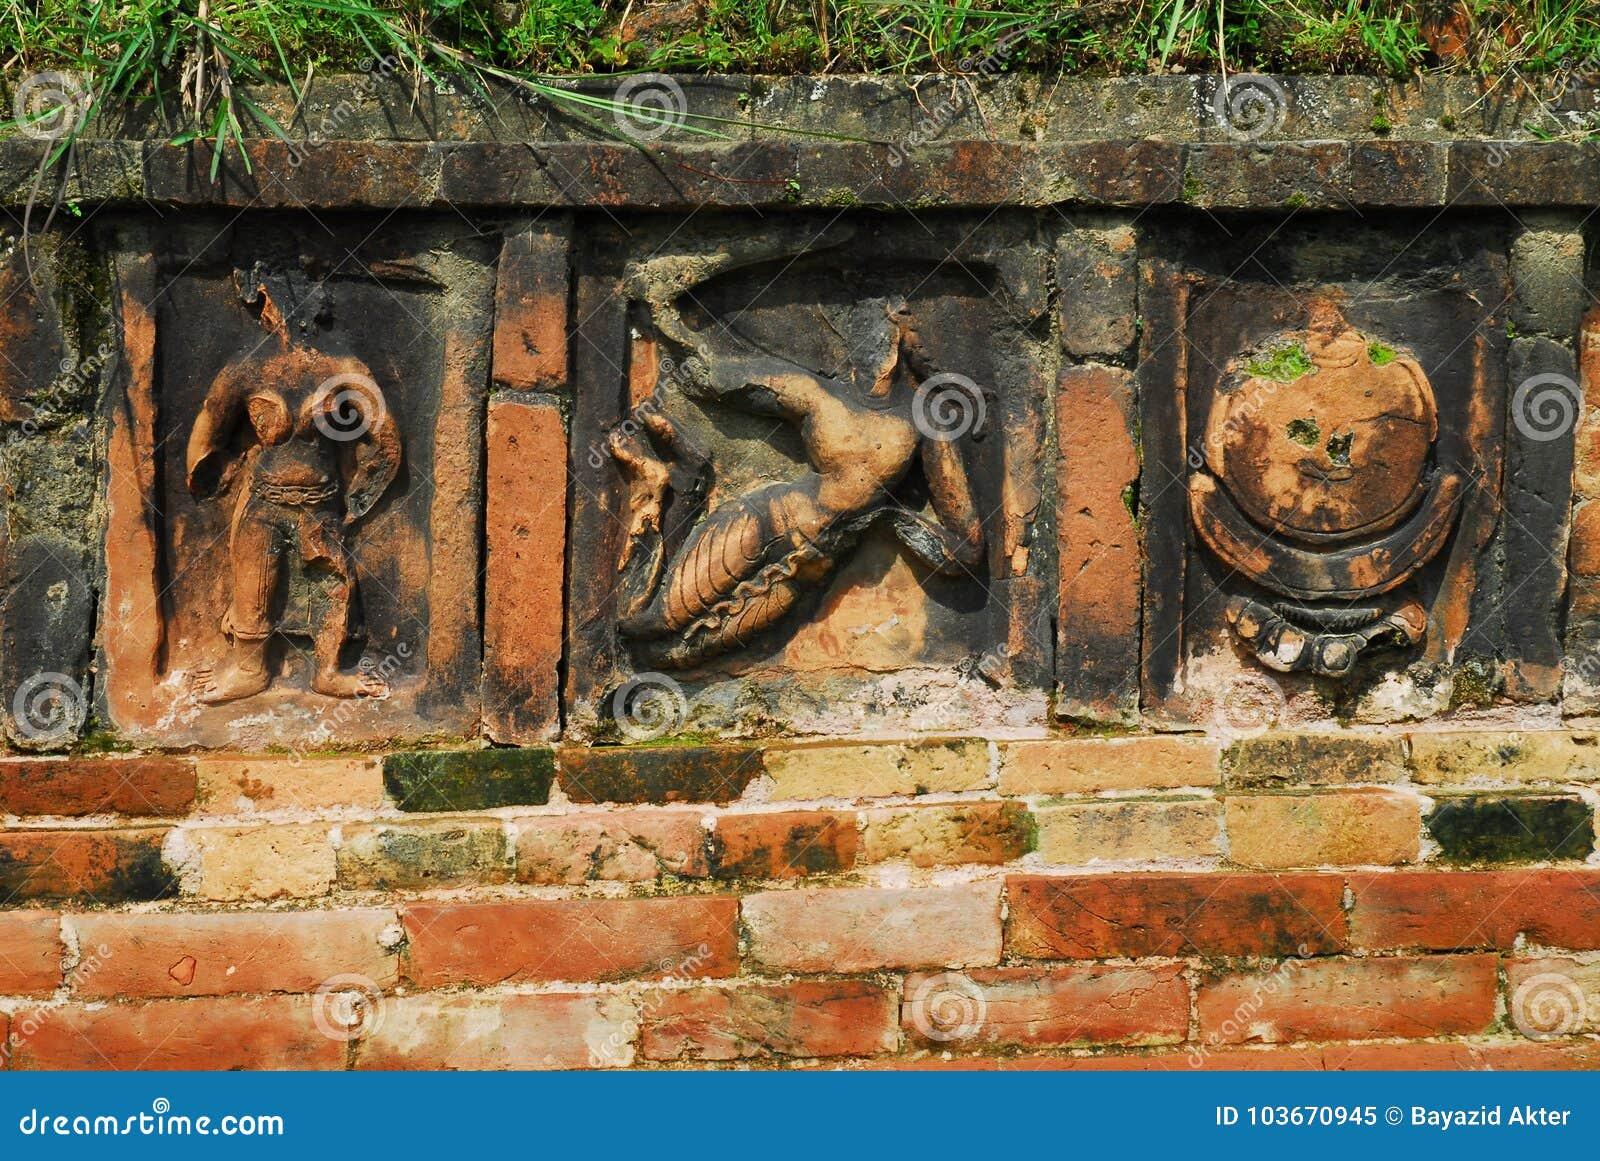 Paharpur Bihar Archeological sites in Bangladesh